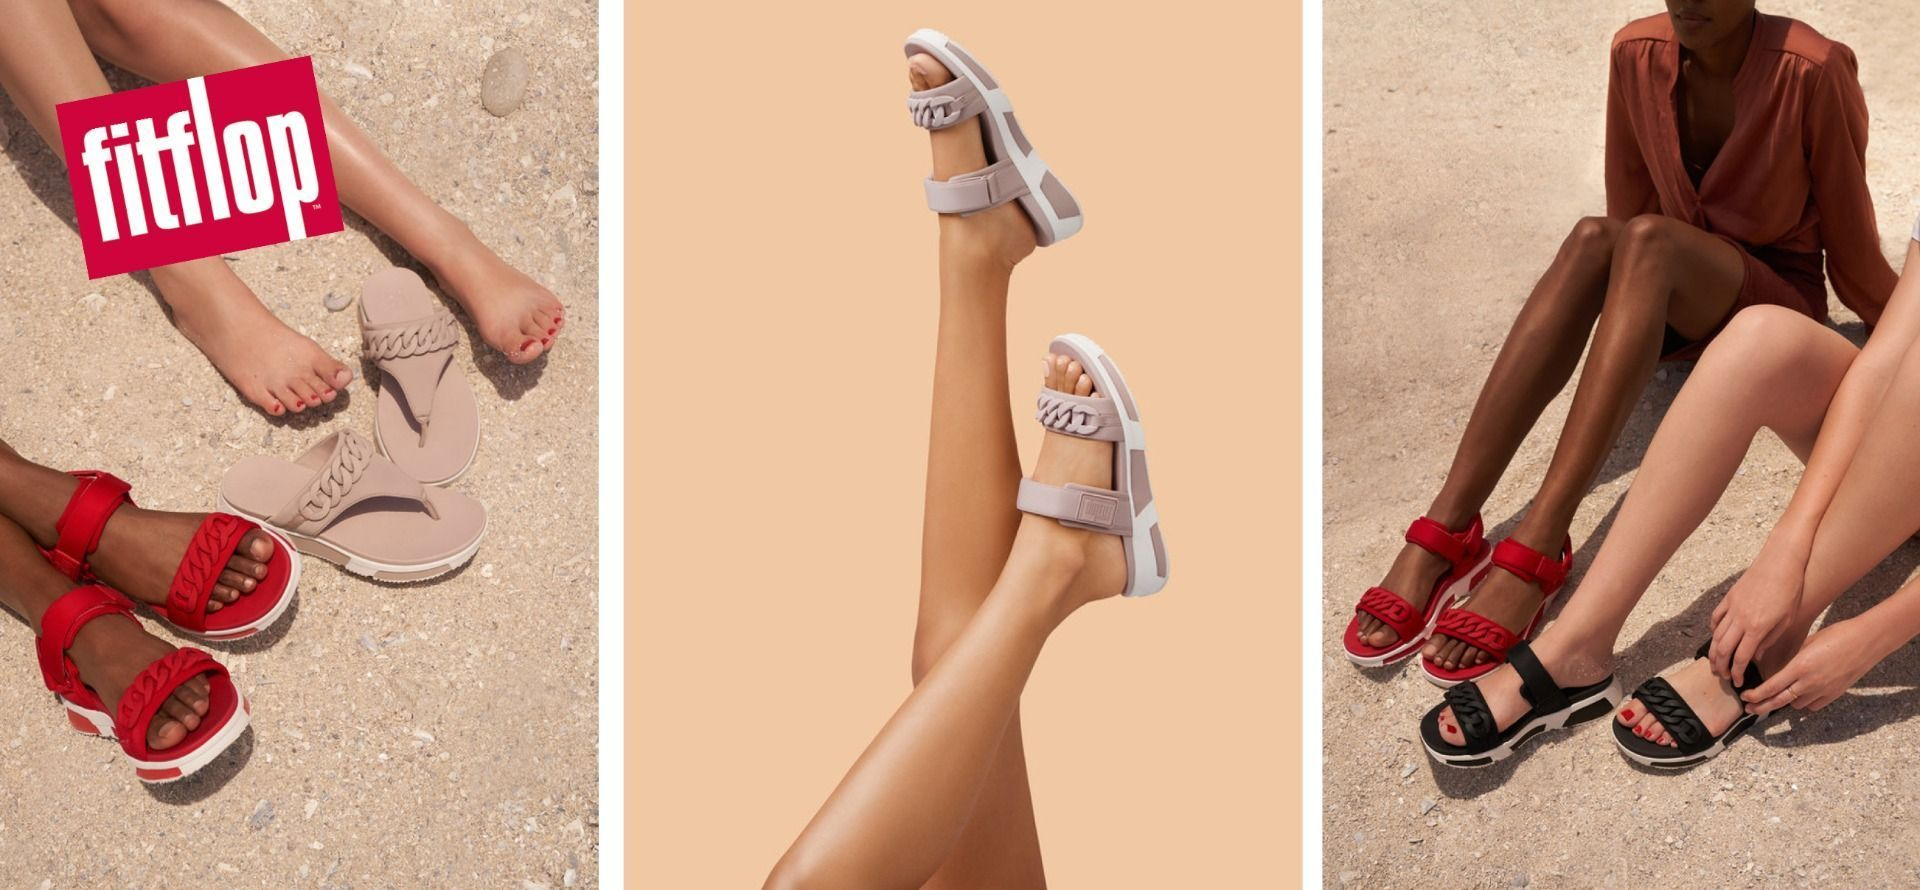 Støtdempende sandaler med god komfort og lekkert design.